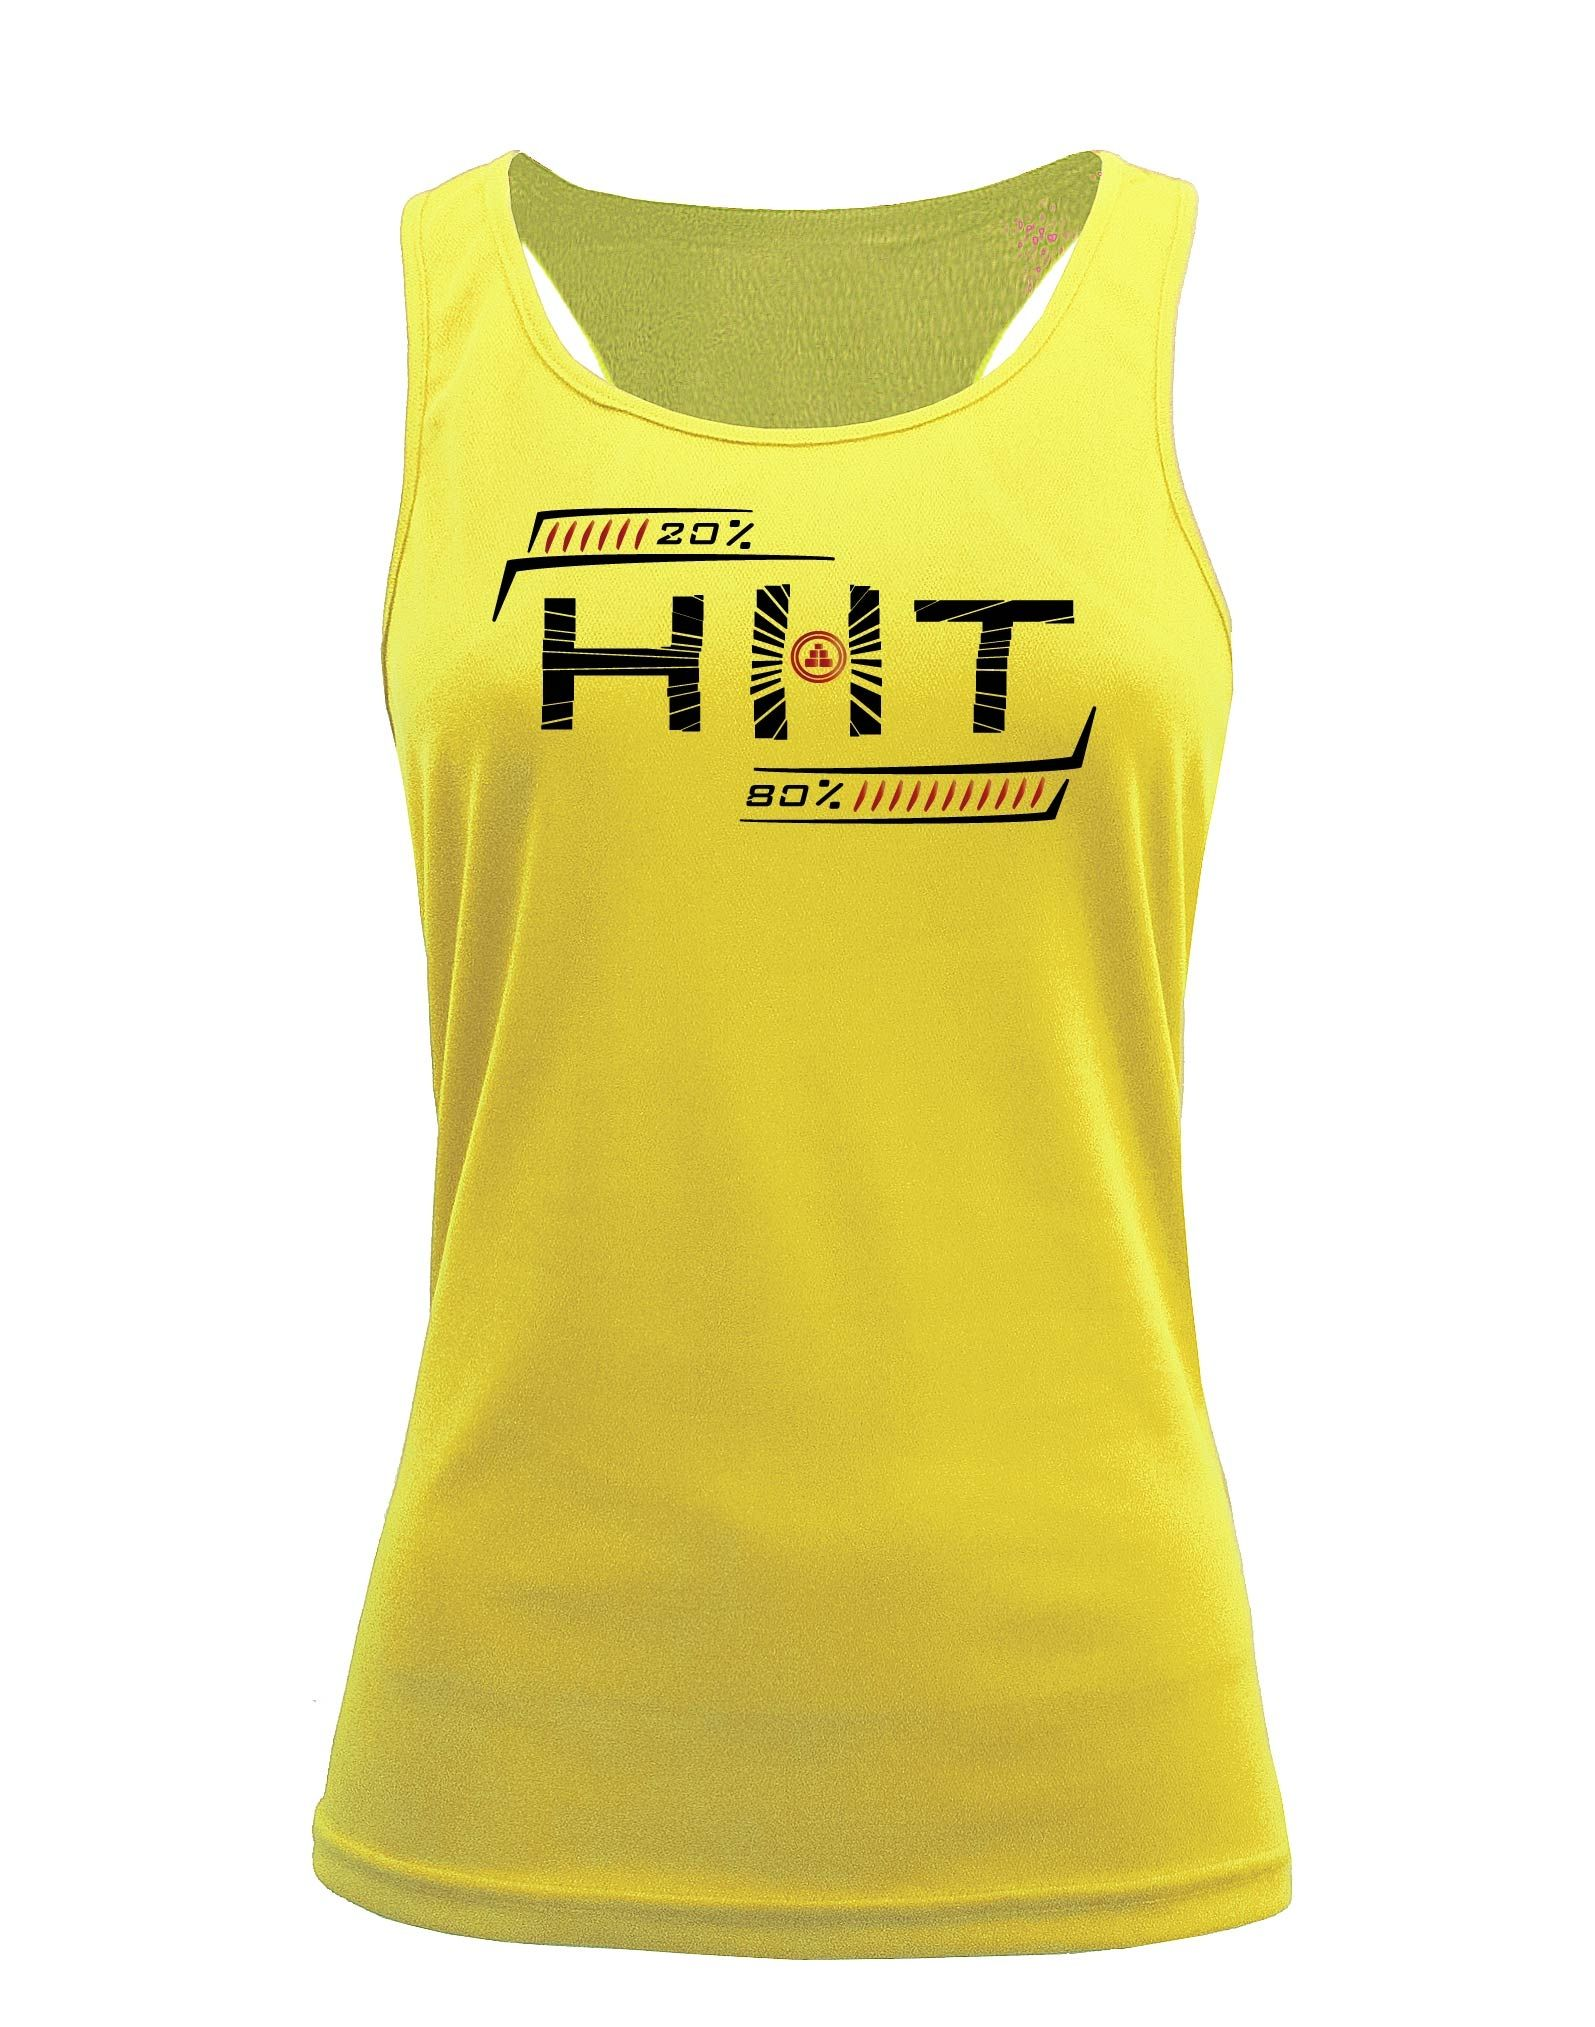 Camiseta fitness de tirantes Entrenamiento HIIT amarilla